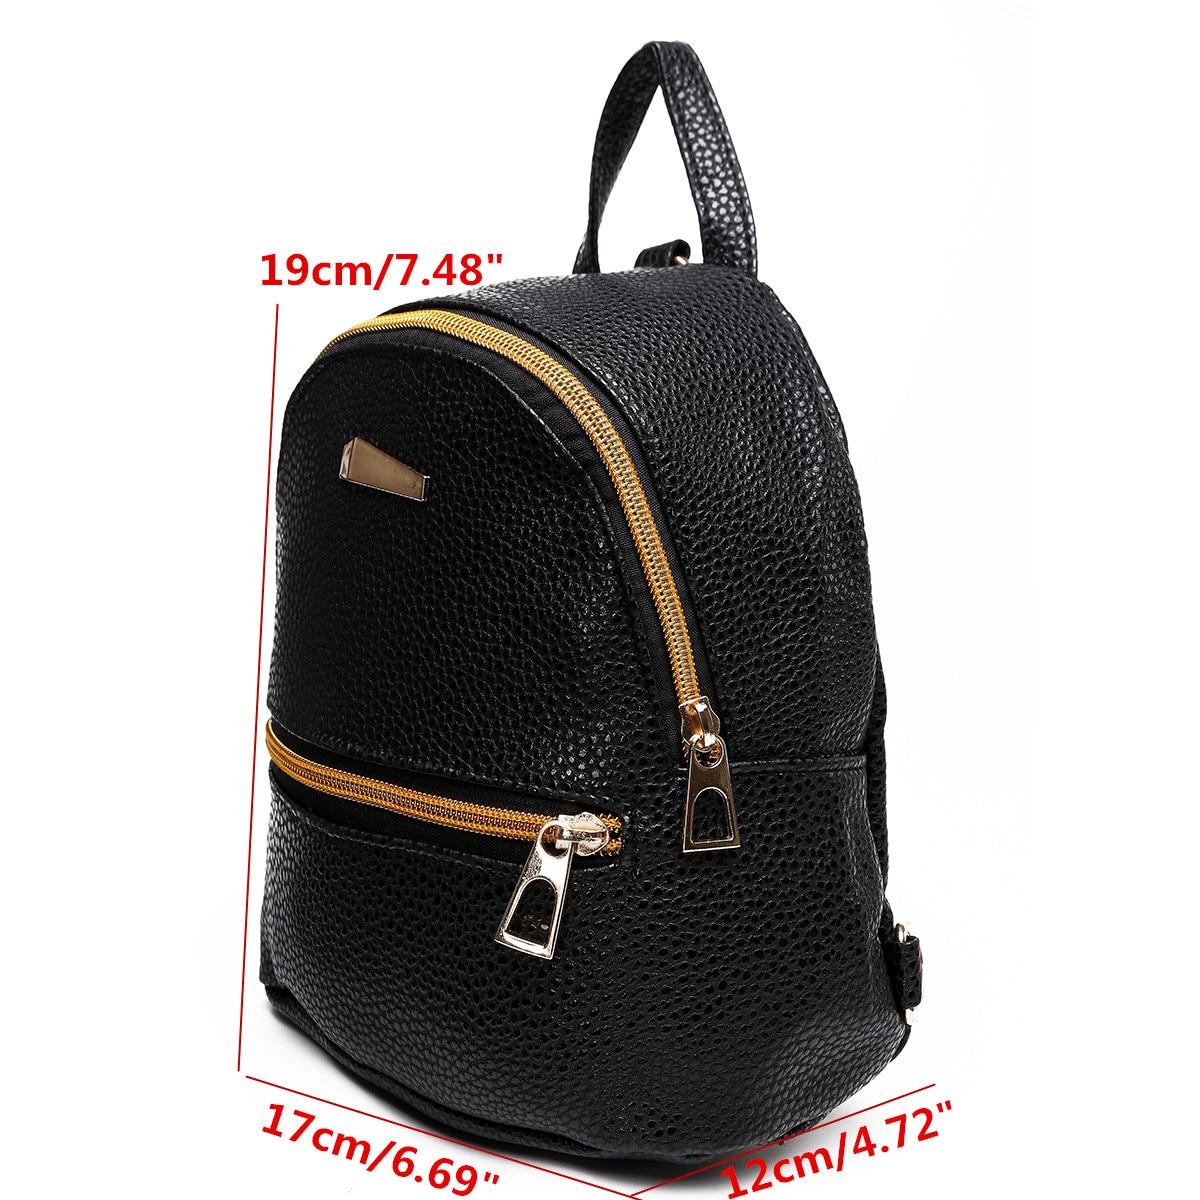 mochilas de couro mini mulheres Key Word 3 : Girls Mochilas